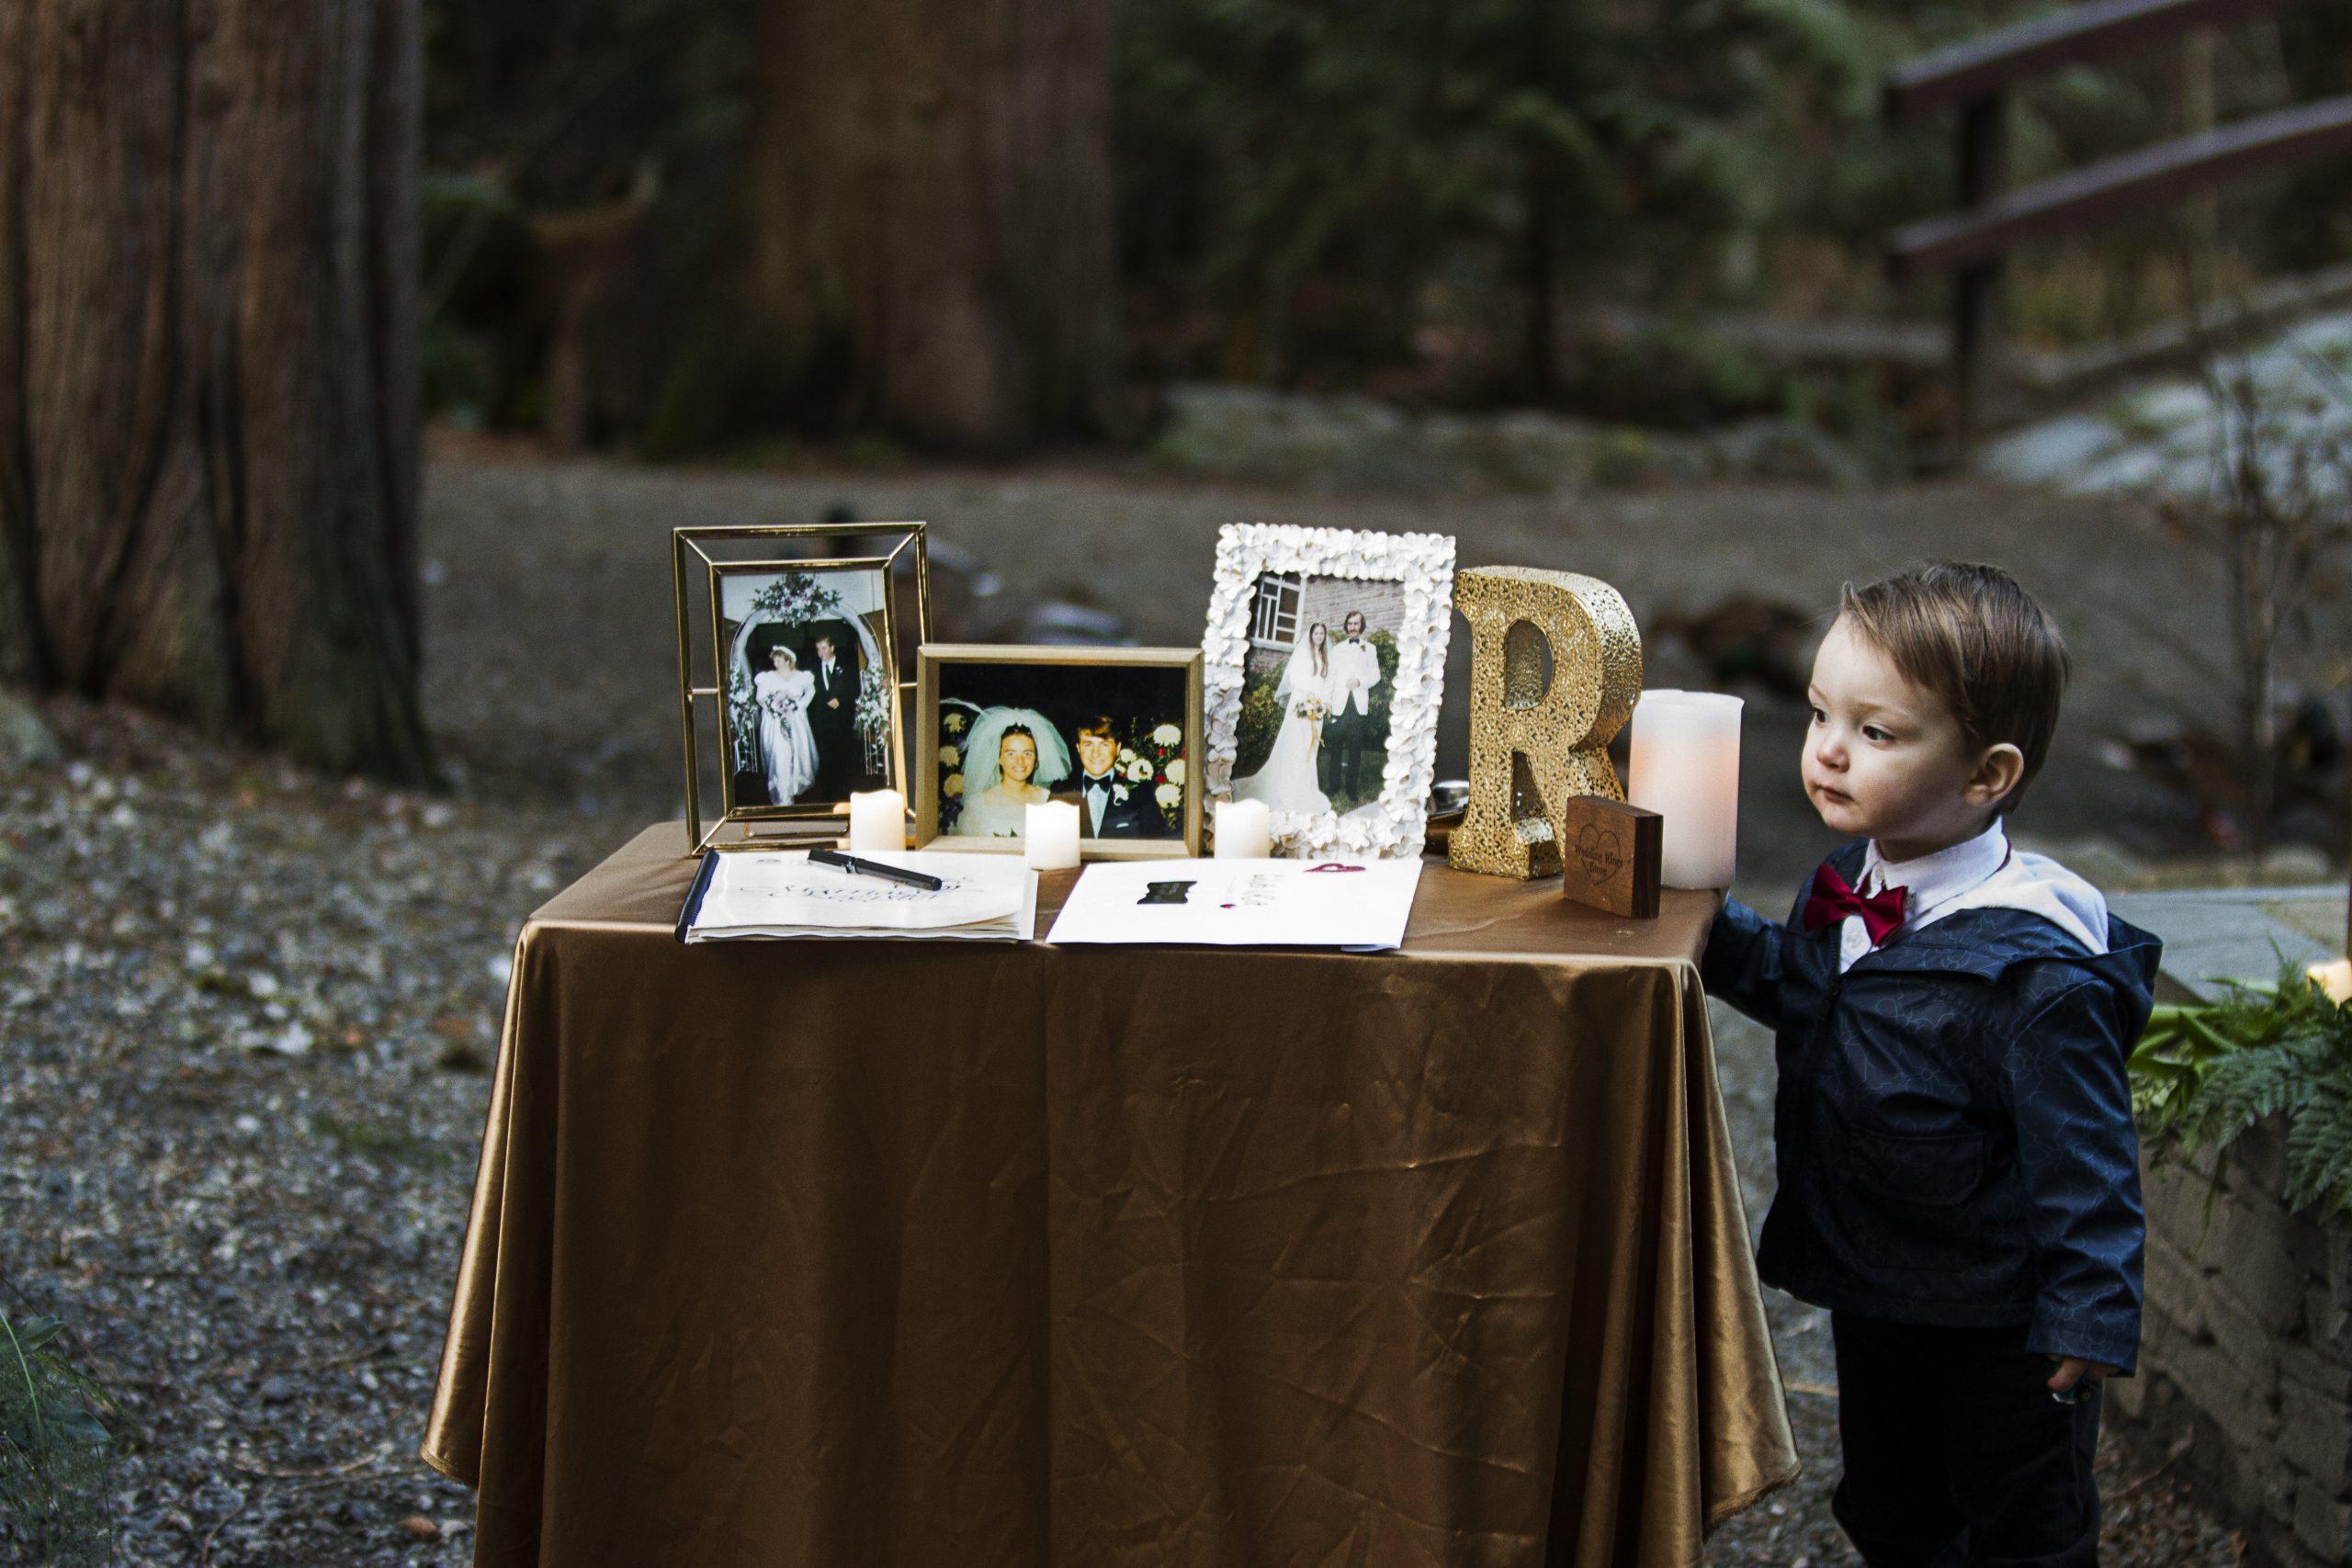 Nanaimo Elopement Photographer   Parksville Elopement Photography   Elopements   Elopement Inspiration